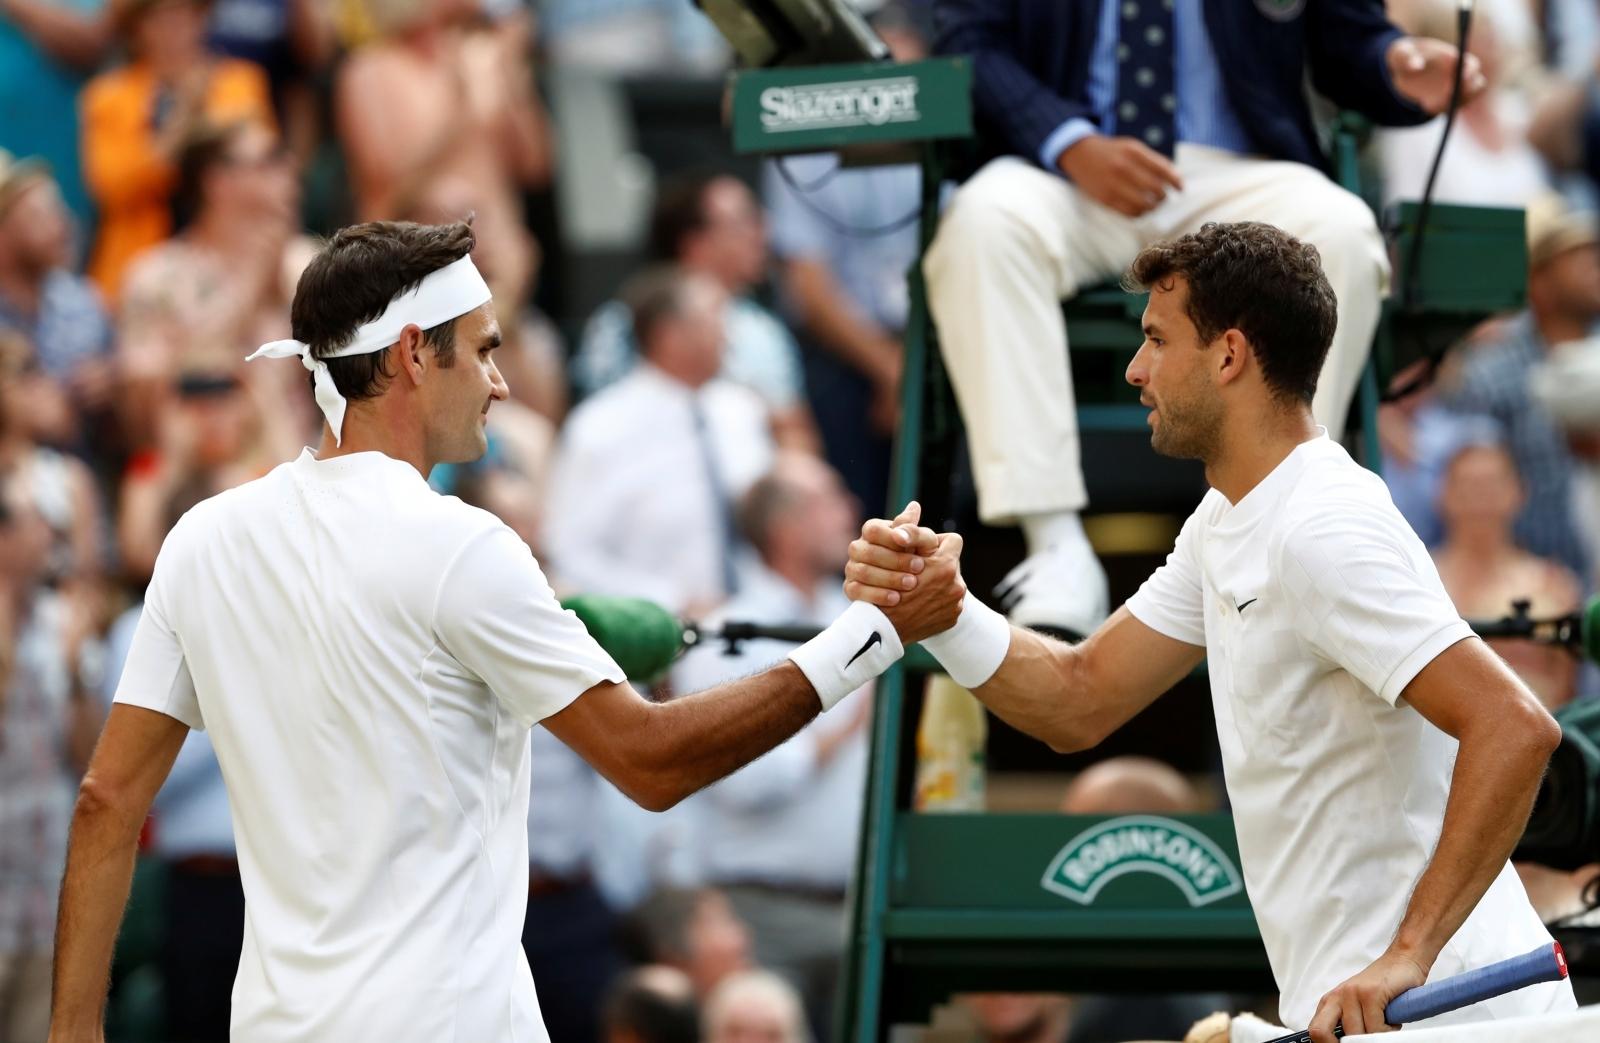 Federer and Dimitrov